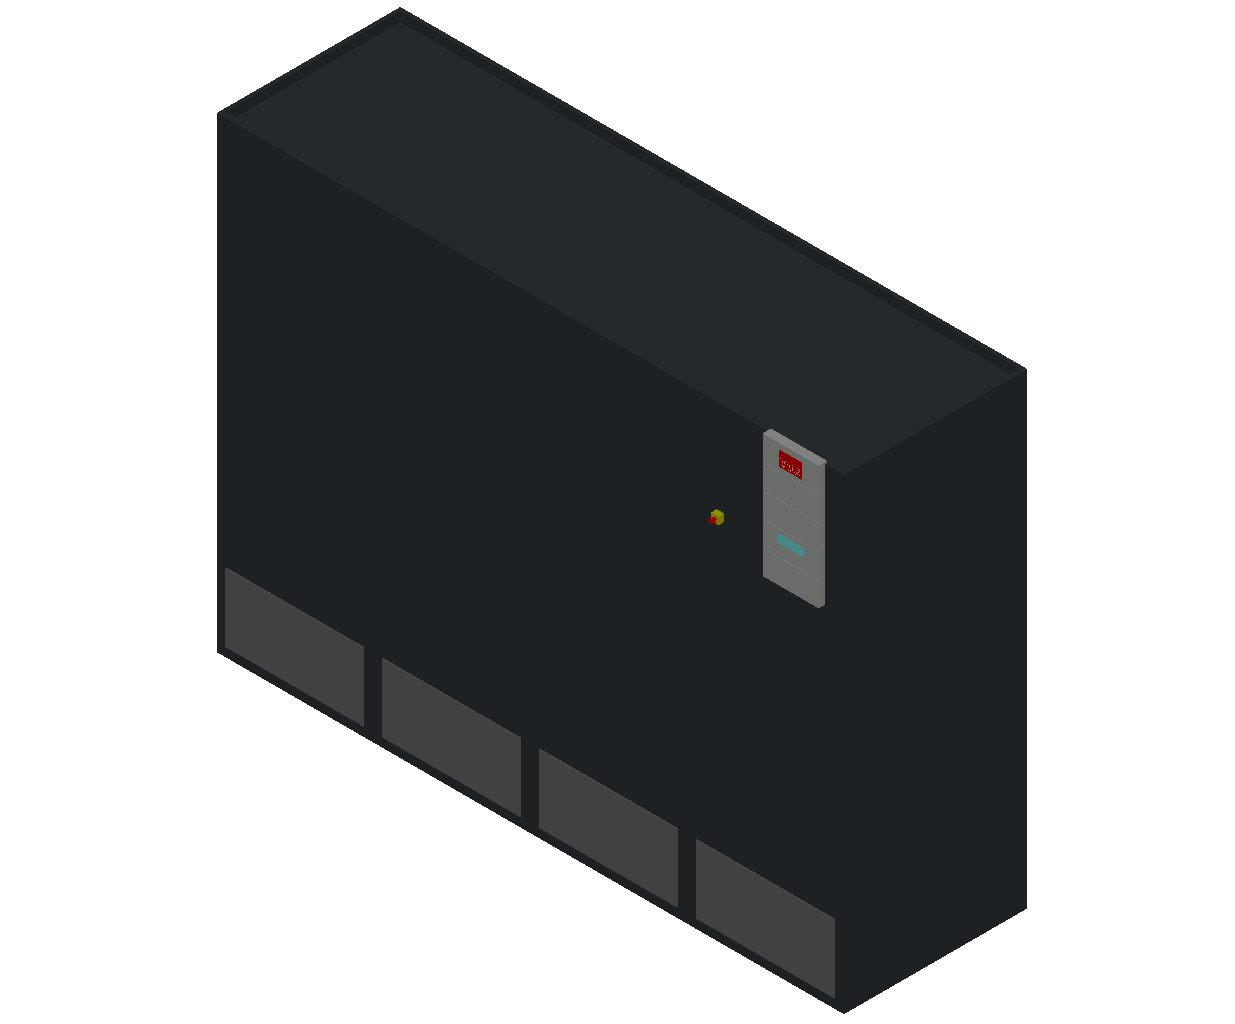 HC_Air Conditioner_Indoor Unit_MEPcontent_STULZ_CyberAir 3PRO_ASR_CW2_ASR_2160_CW2_INT-EN.dwg